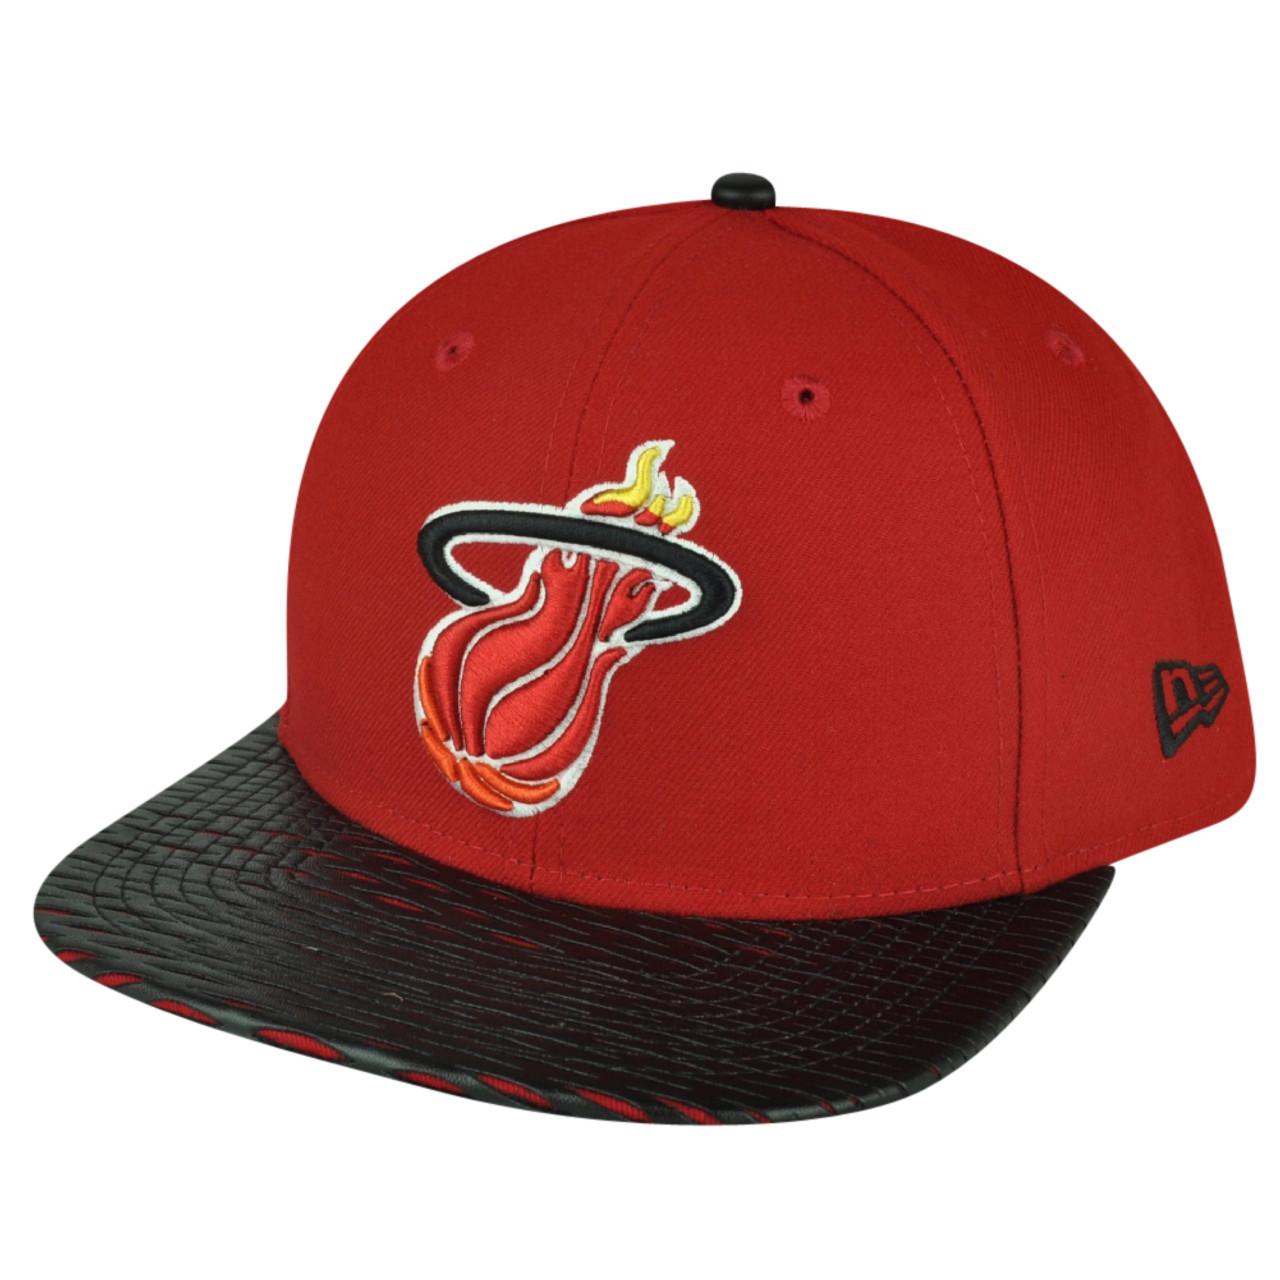 more photos ef9ec bc7a0 NBA New Era 9Fifty 950 Leather Rip Miami Heat Snapback Hat Cap Flat Bill Red